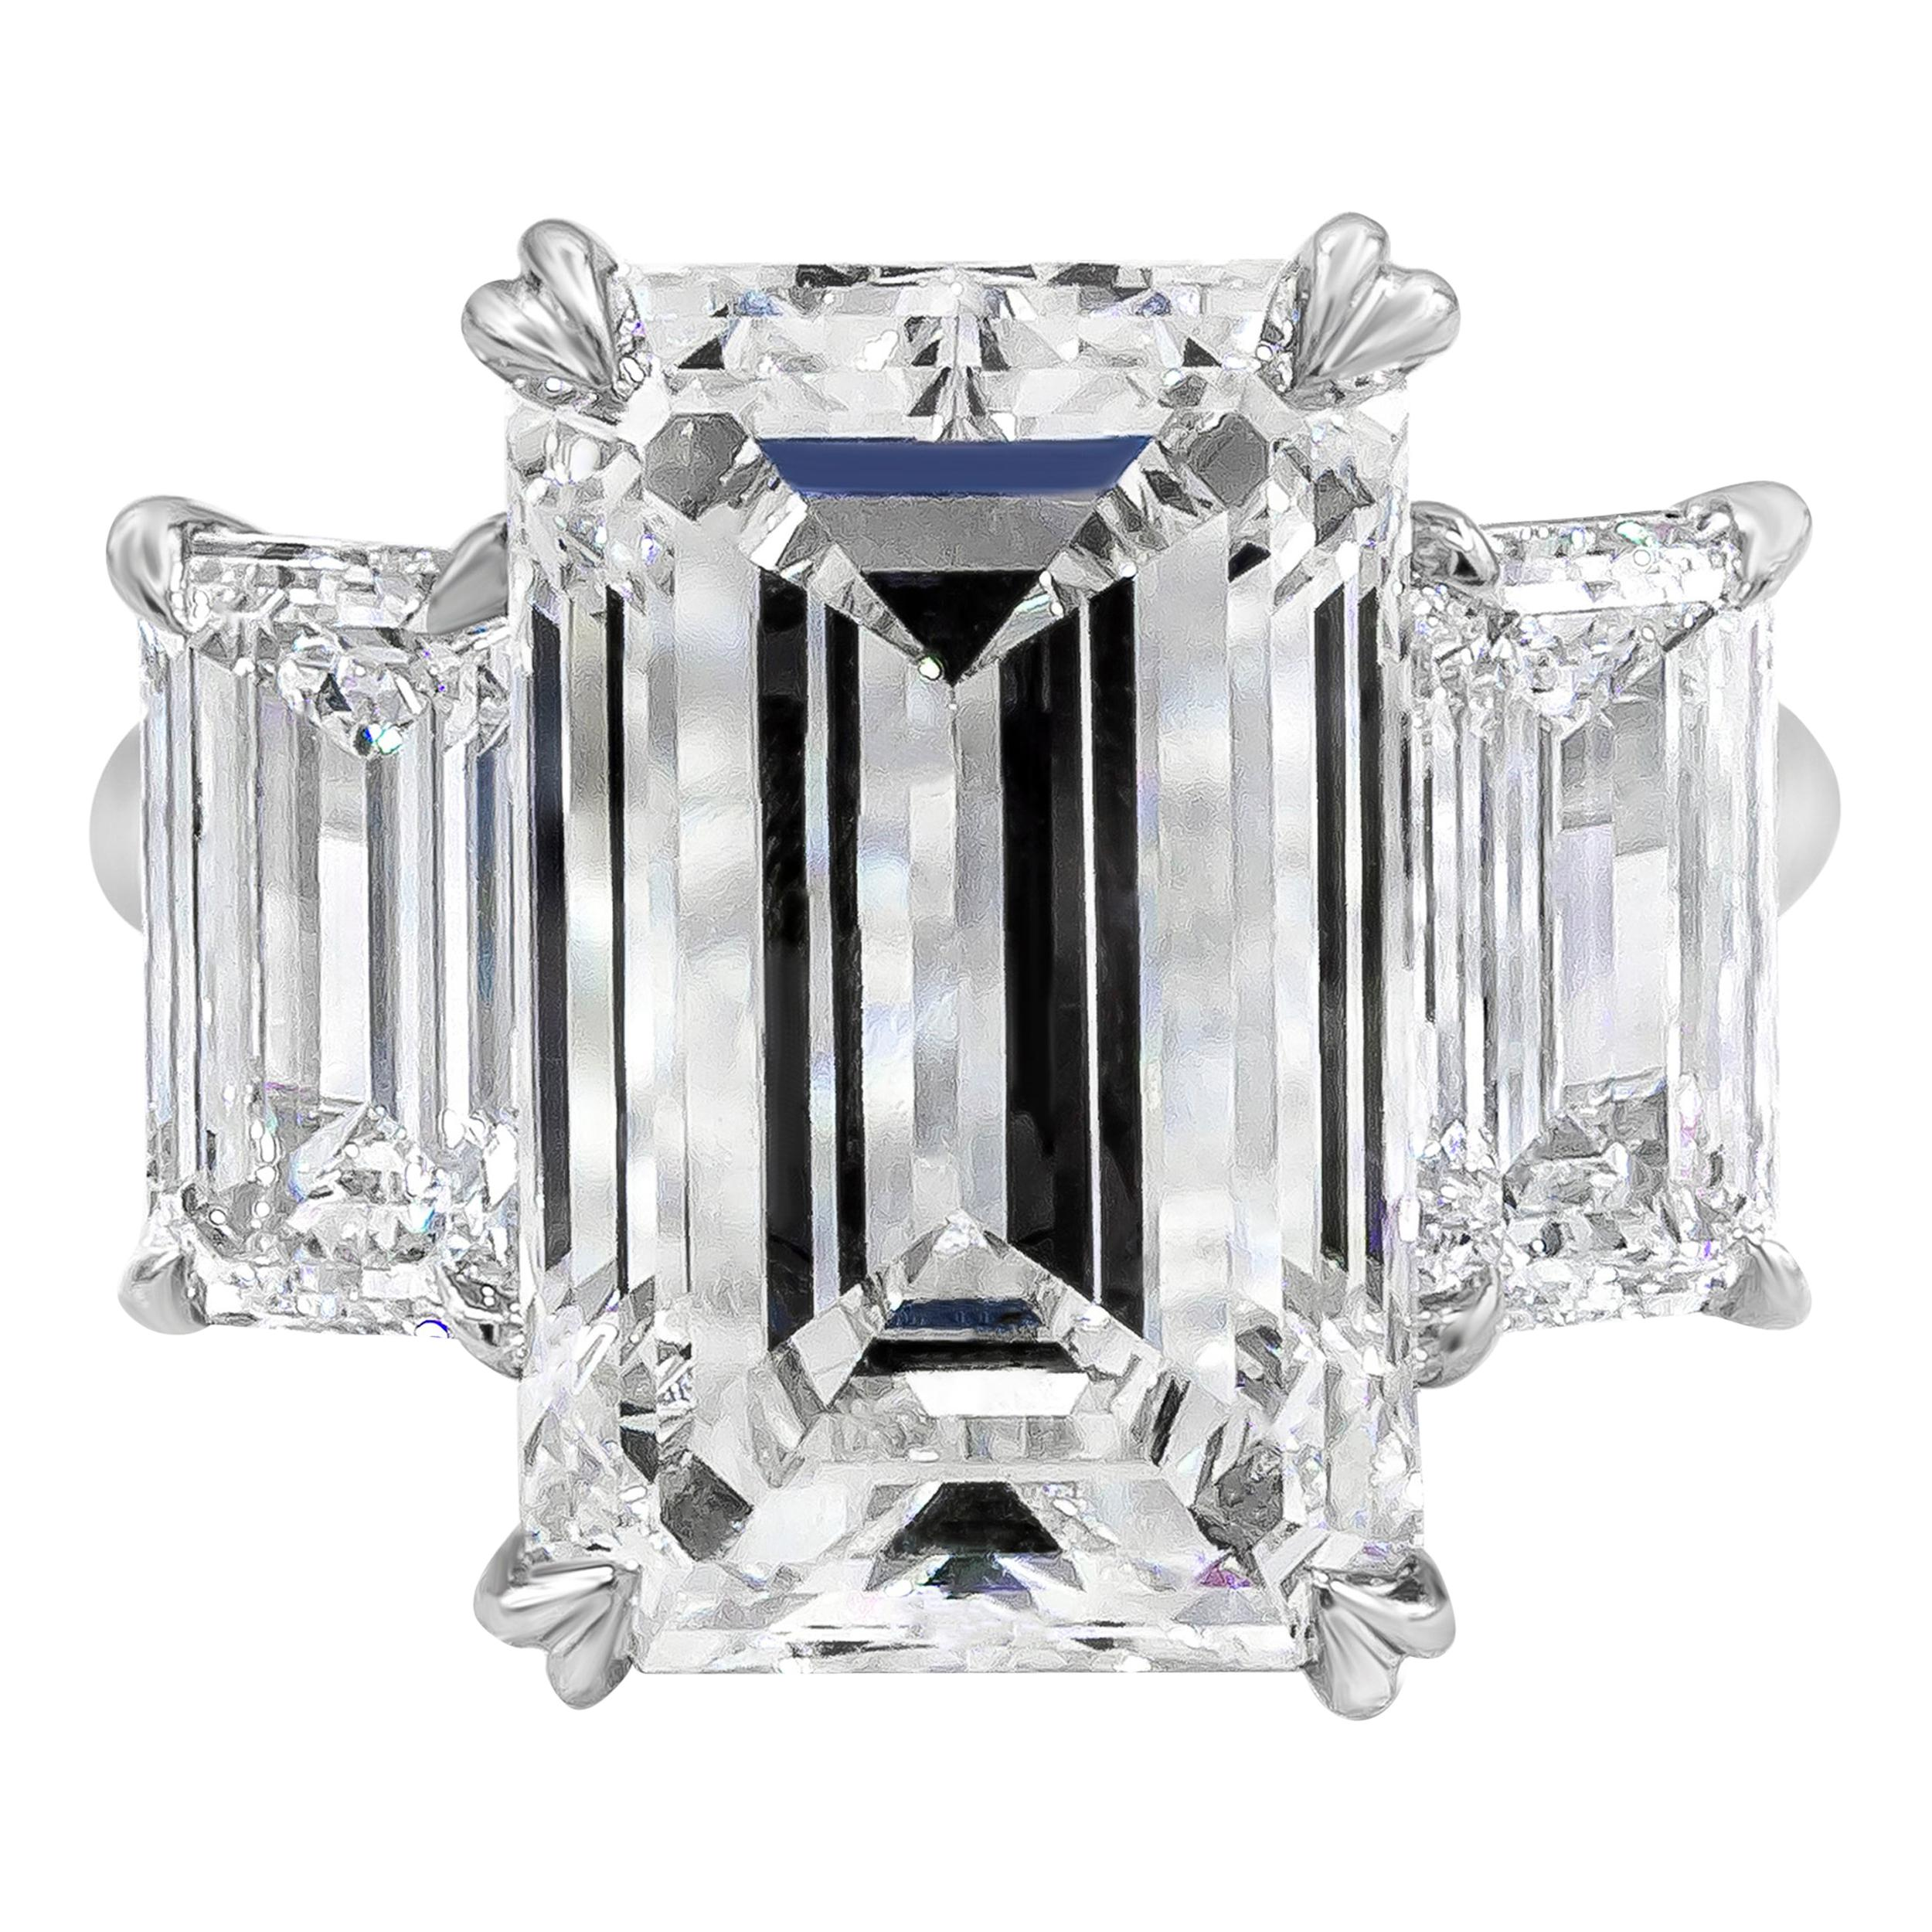 Roman Malakov GIA Certified Emerald Cut Diamond Three-Stone Engagement Ring